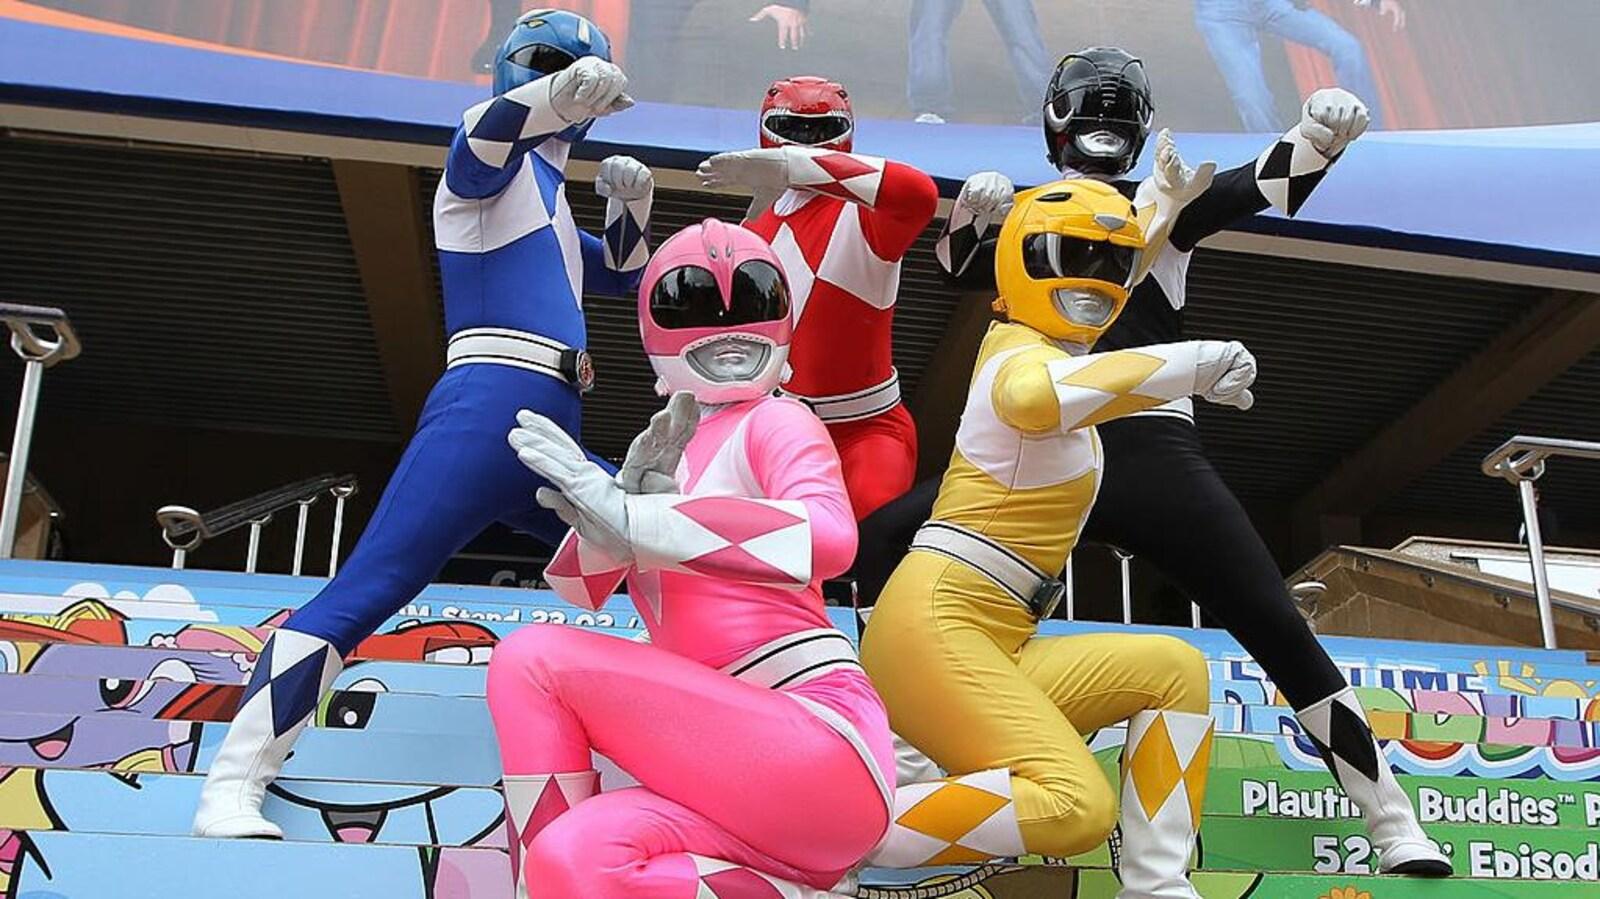 Les 5 Power Rangers en costume